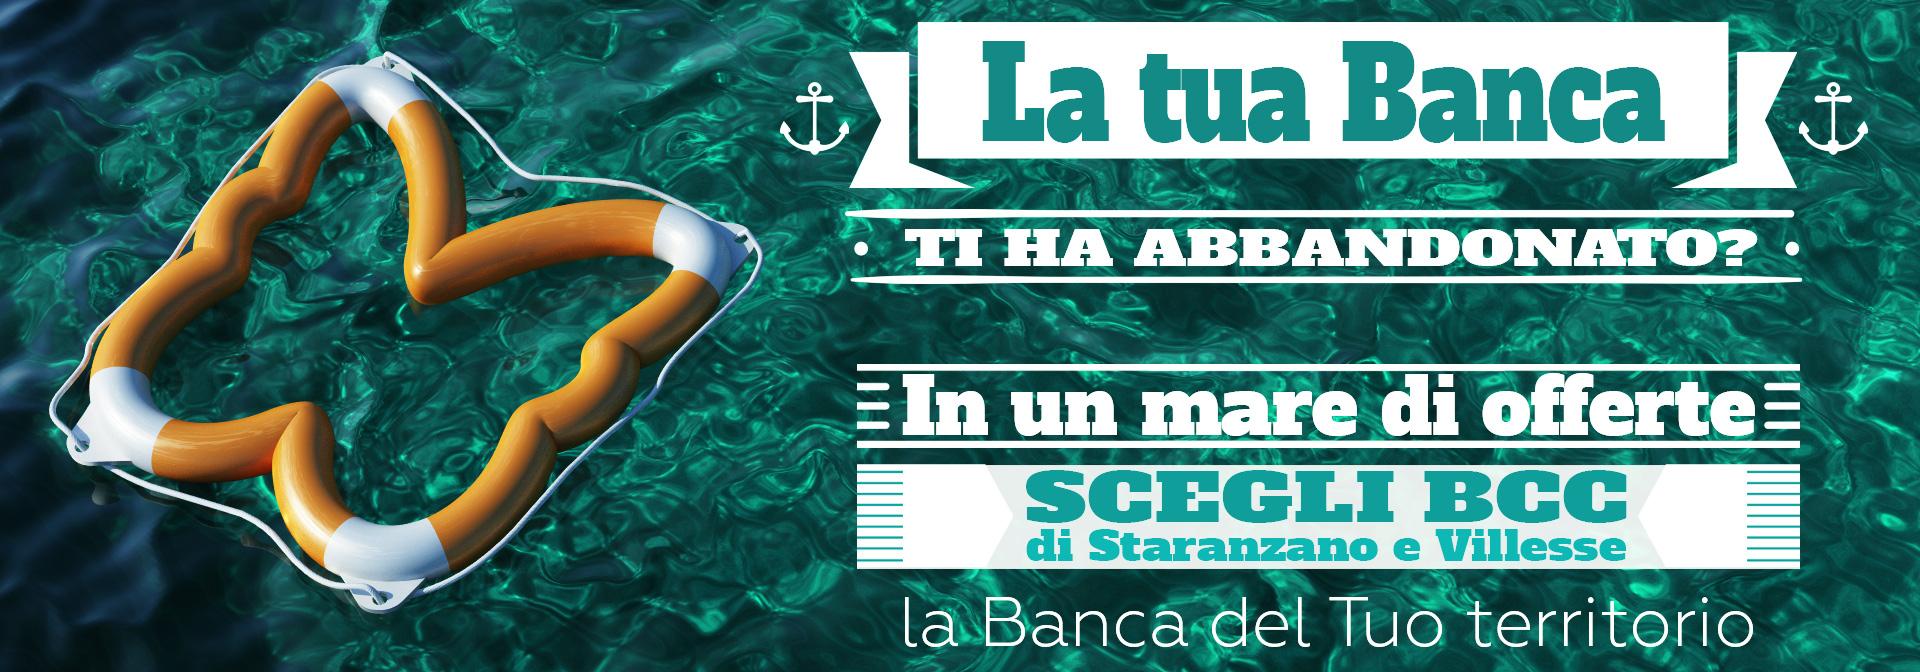 Bcc Staranzano E Villesse Offerta Bcc Sv